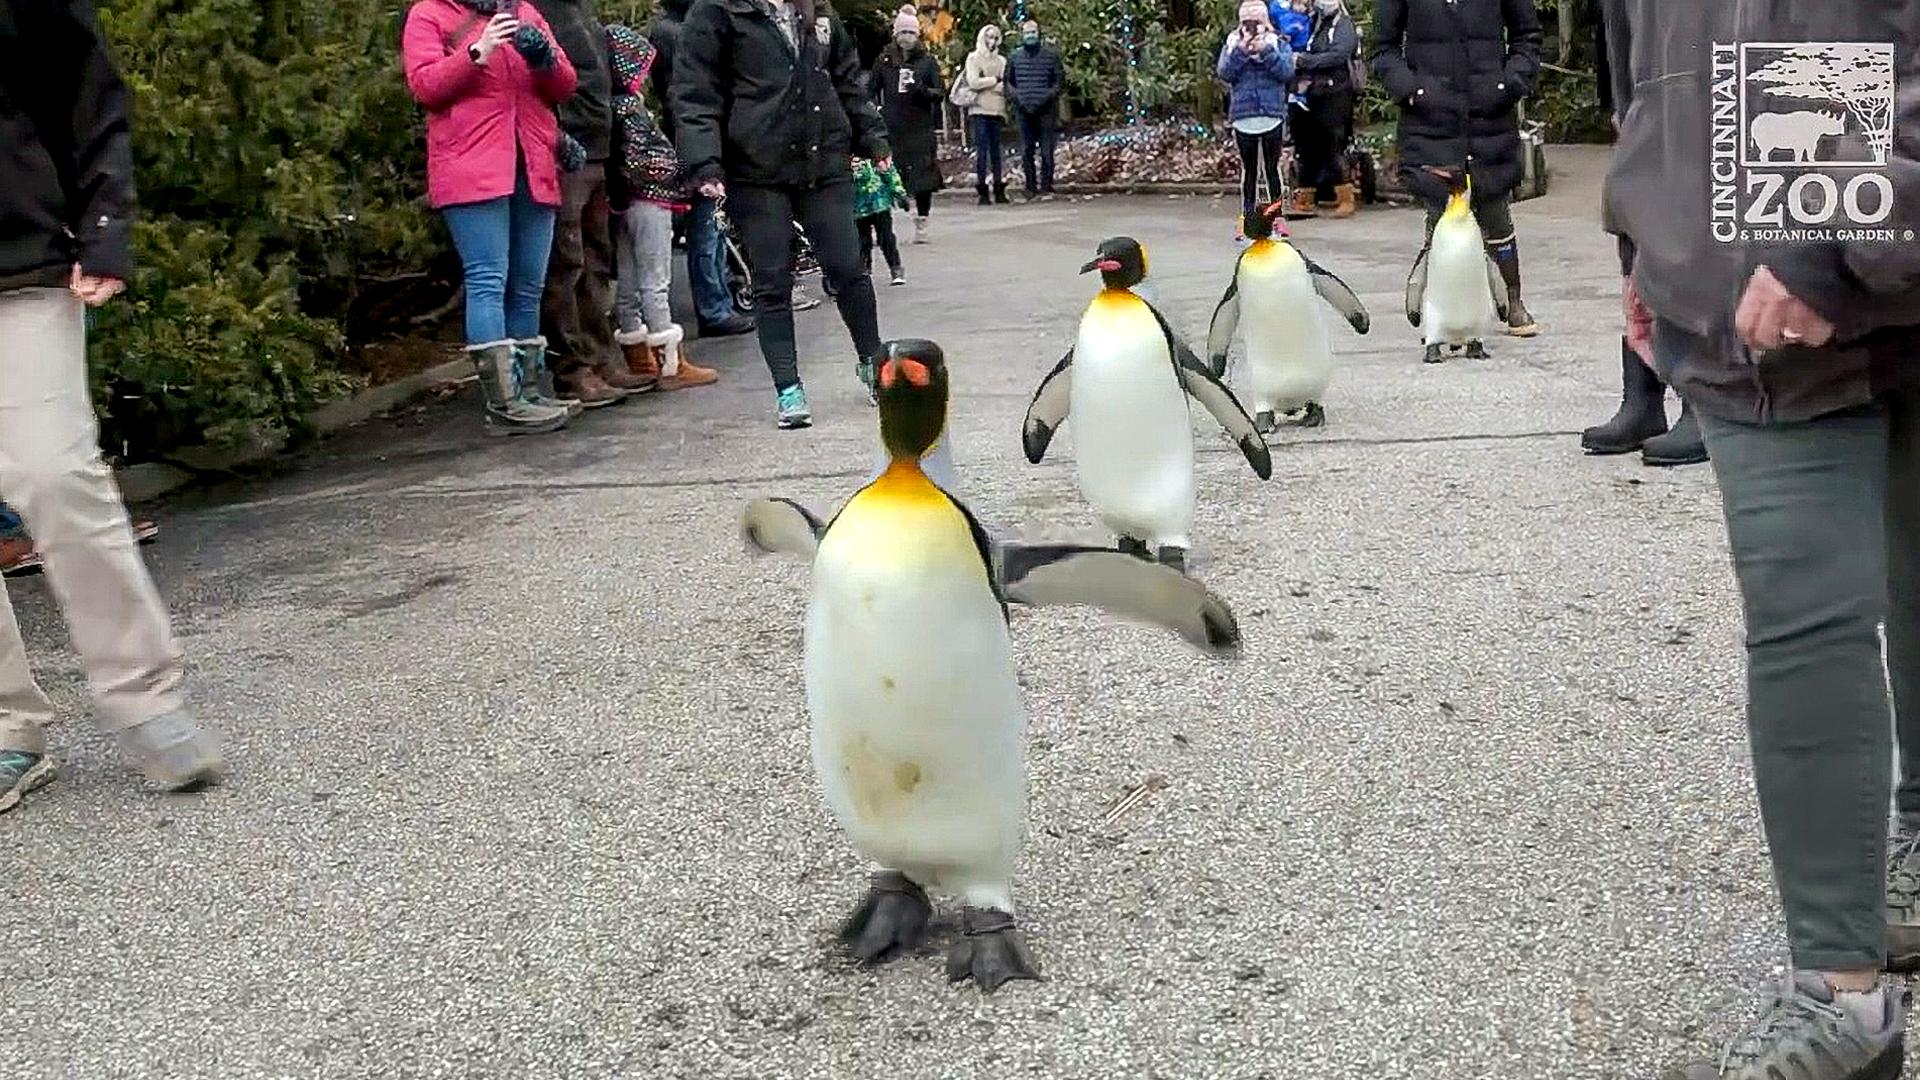 VIDEO: Adorable penguins go on parade at Cincinnati Zoo